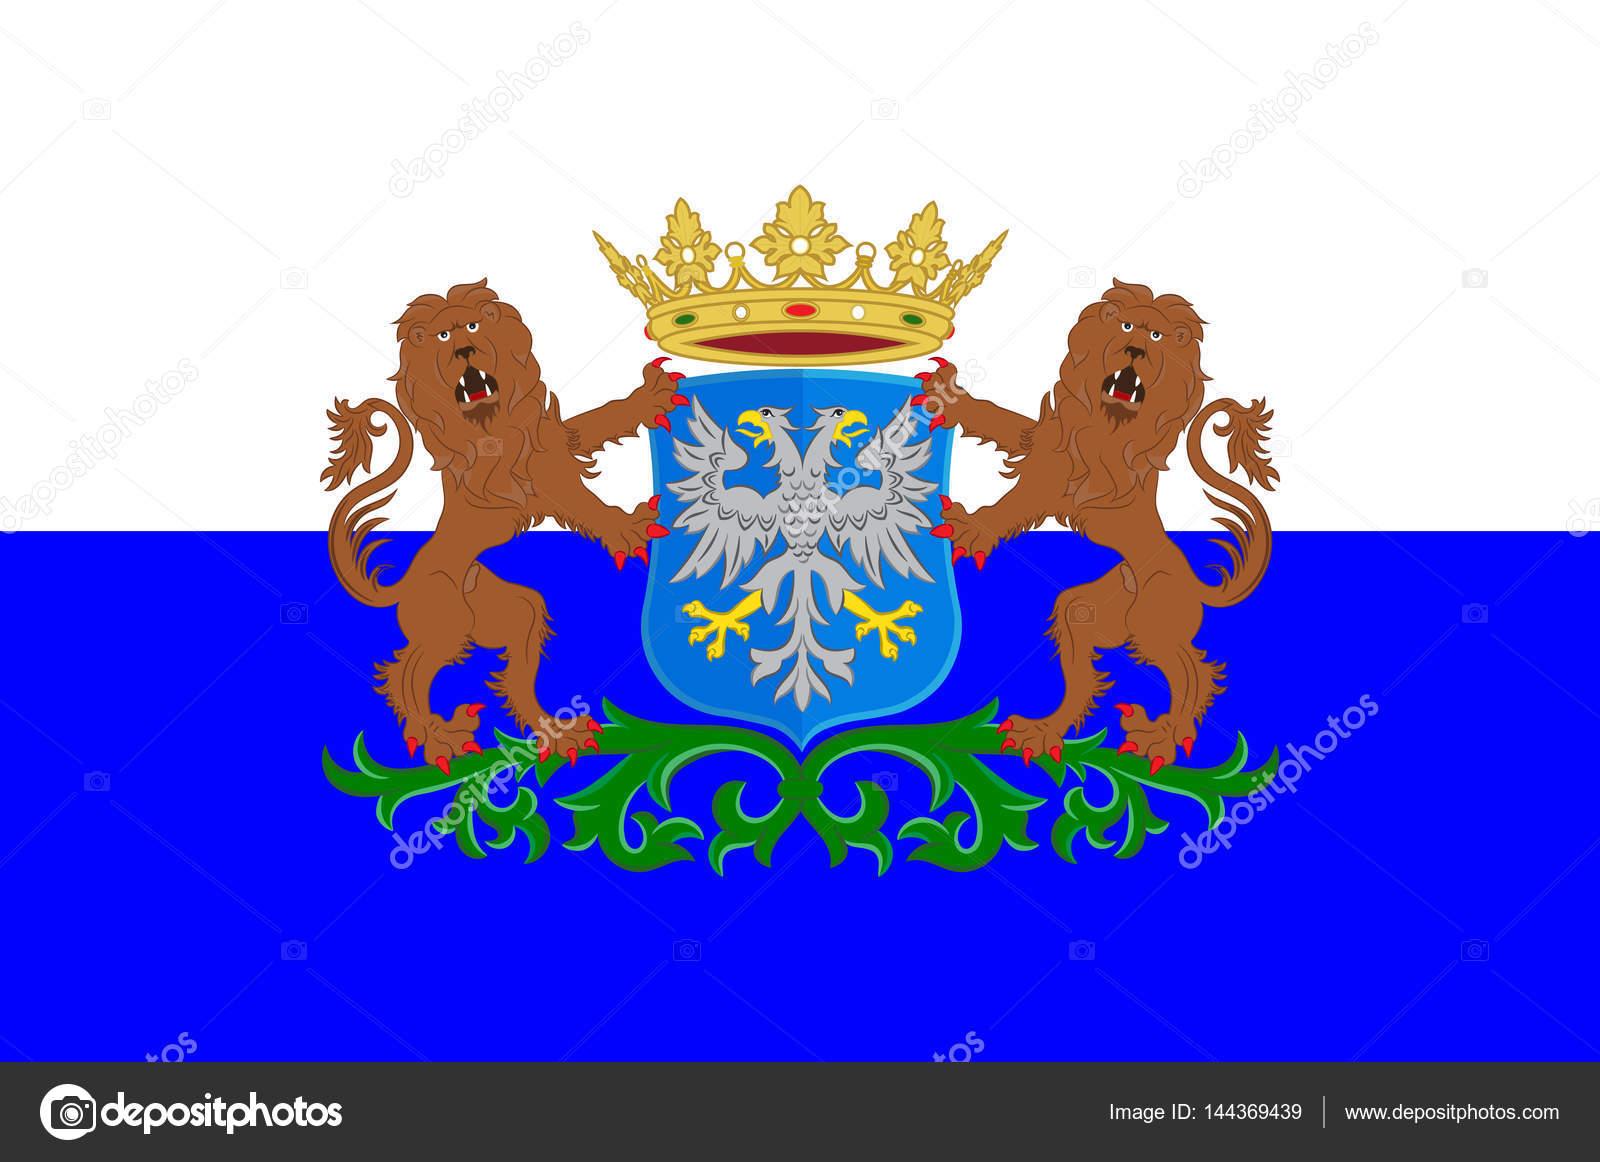 ... flag of Dutch province Gelderland flying in the wind